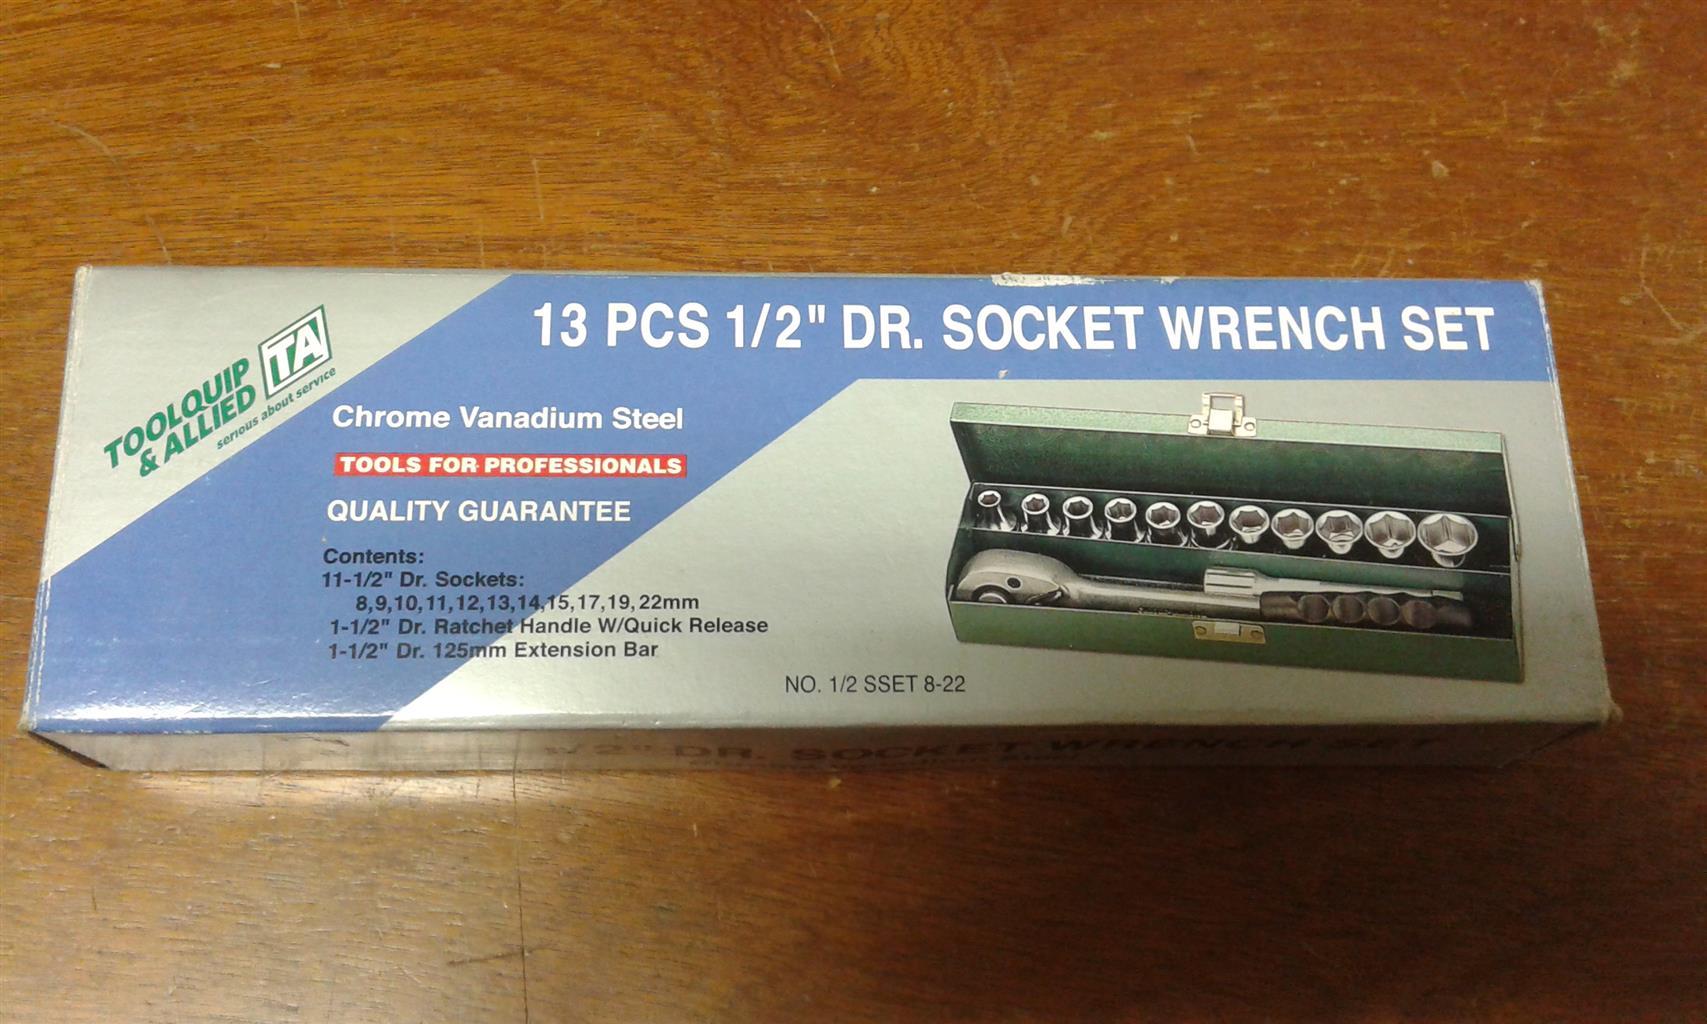 "13 pcs 1/2"" DR. SOCKET WRENCH SET"